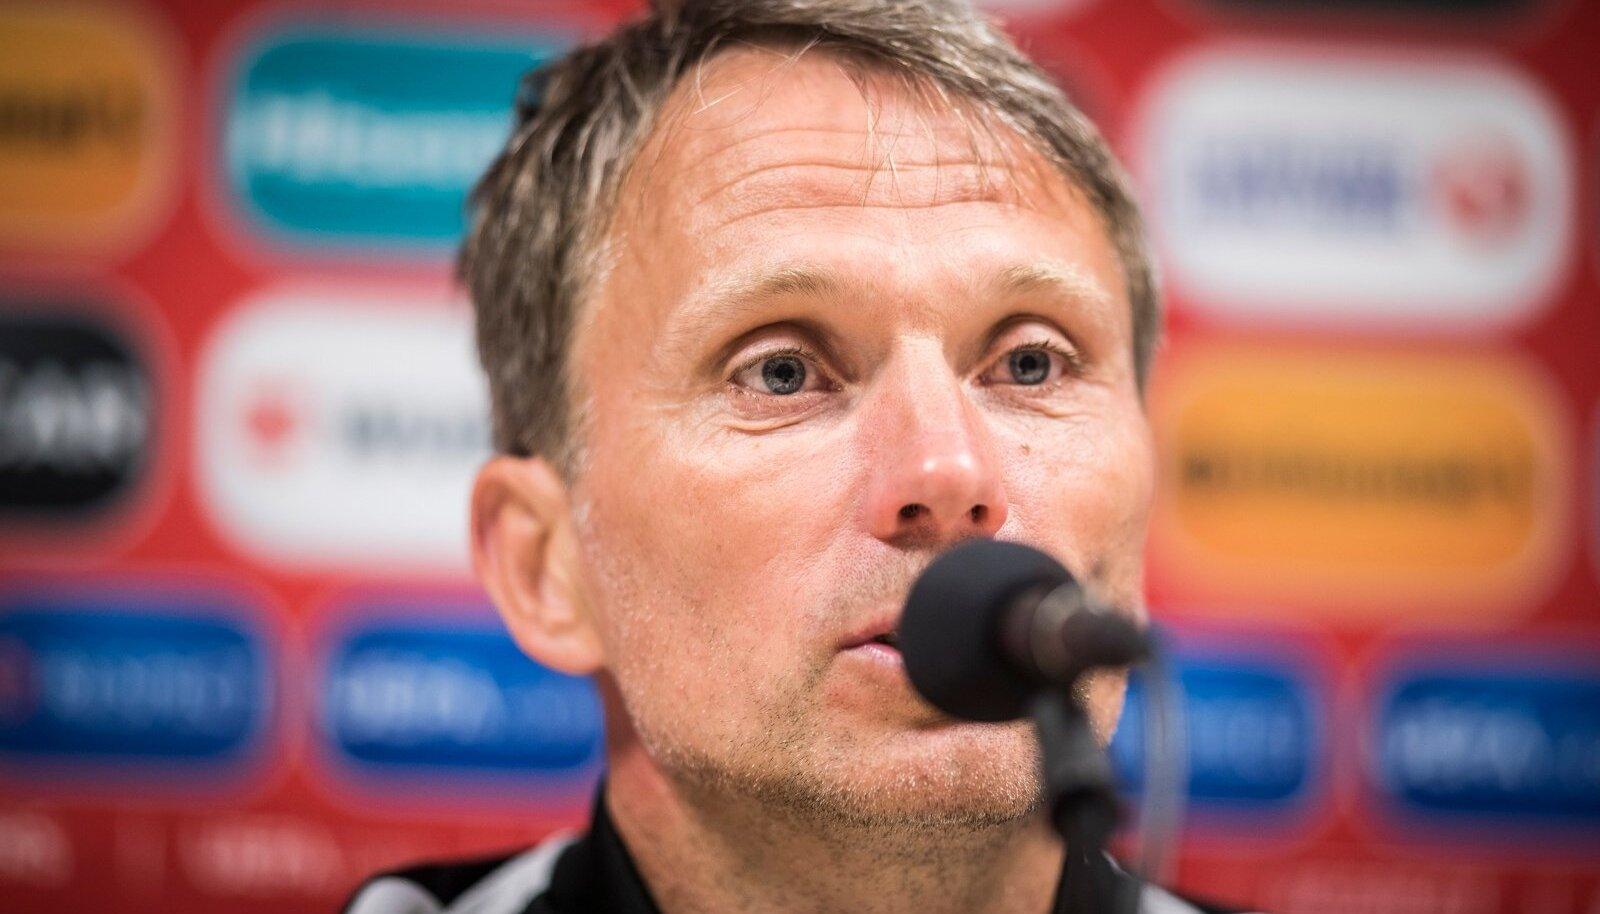 Eesti koondis kaotas Belgiale A. le Coq Arenal 09.06.2017 skooriga 2:0.